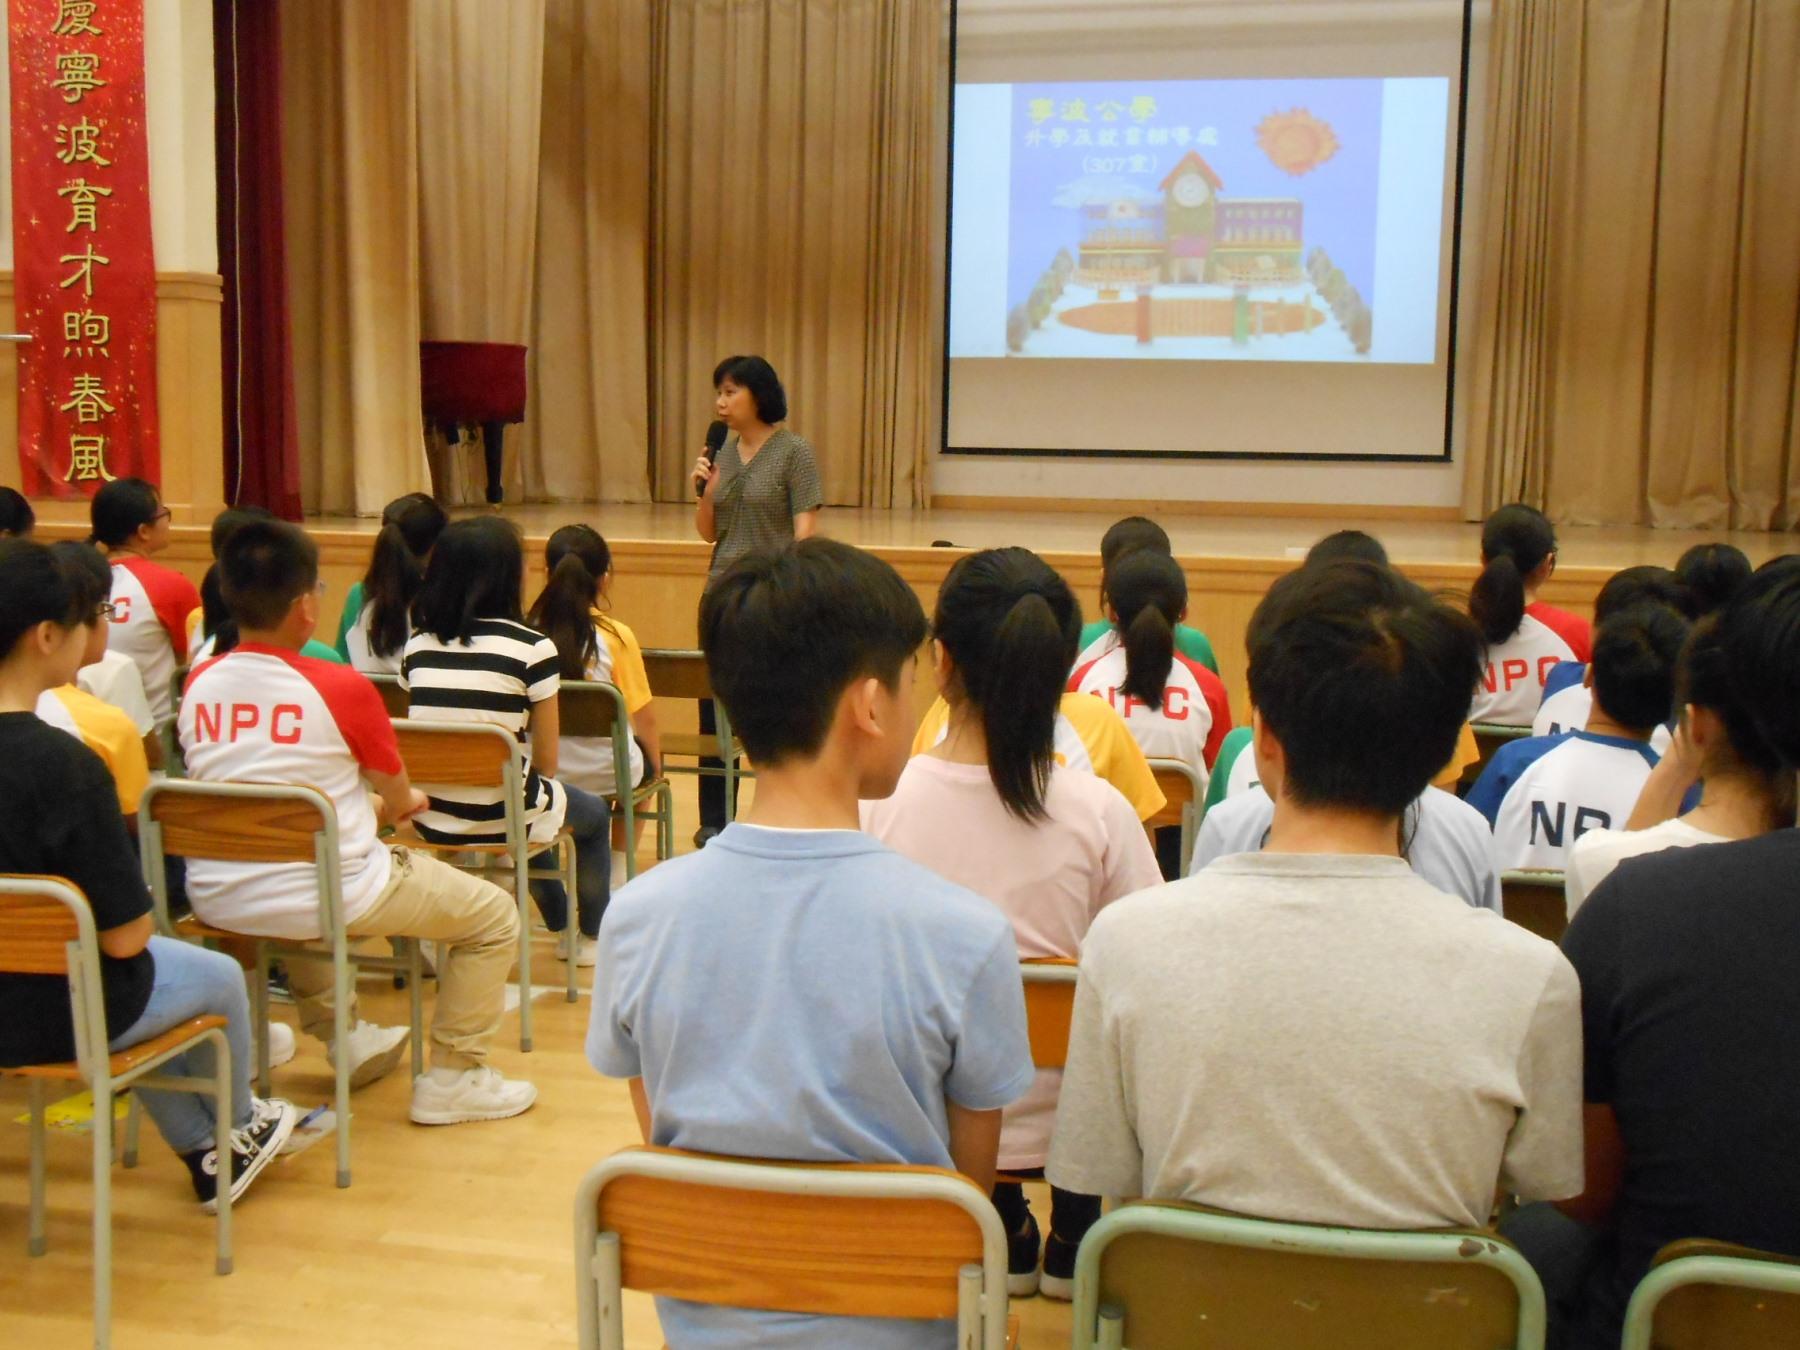 http://npc.edu.hk/sites/default/files/dscn9621.jpg